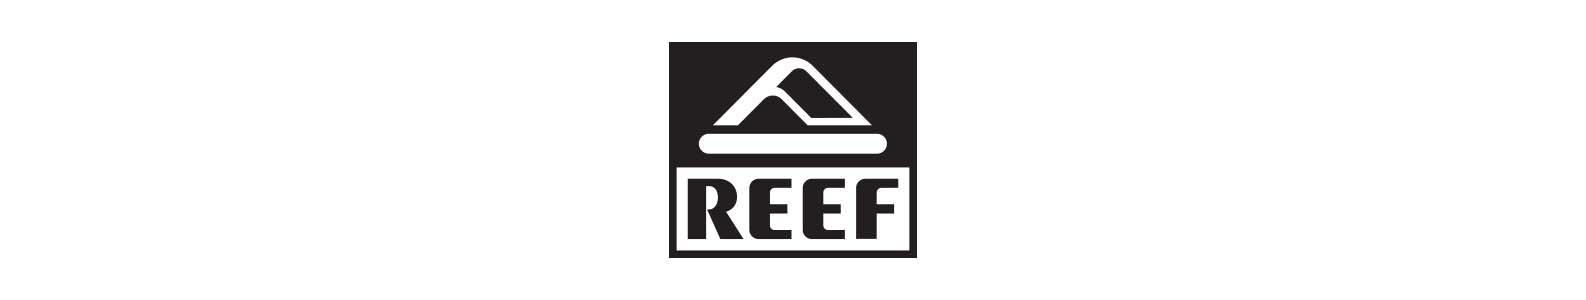 Reef brand header image